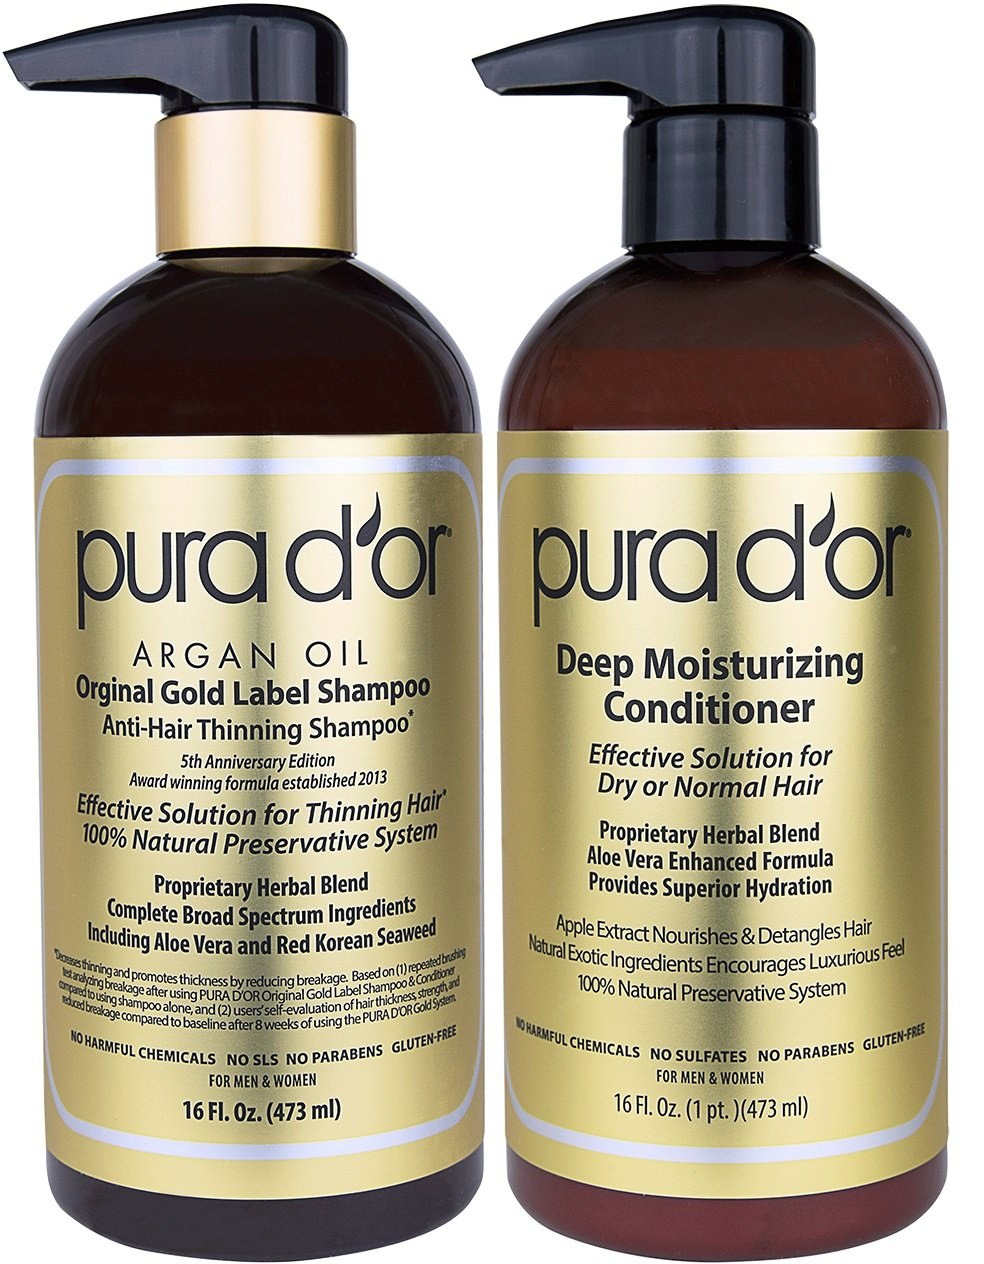 PURA D'OR Deep Moisturizing Premium Organic Argan Oil & Aloe Vera Conditioner, 16 Fluid Ounce 00609